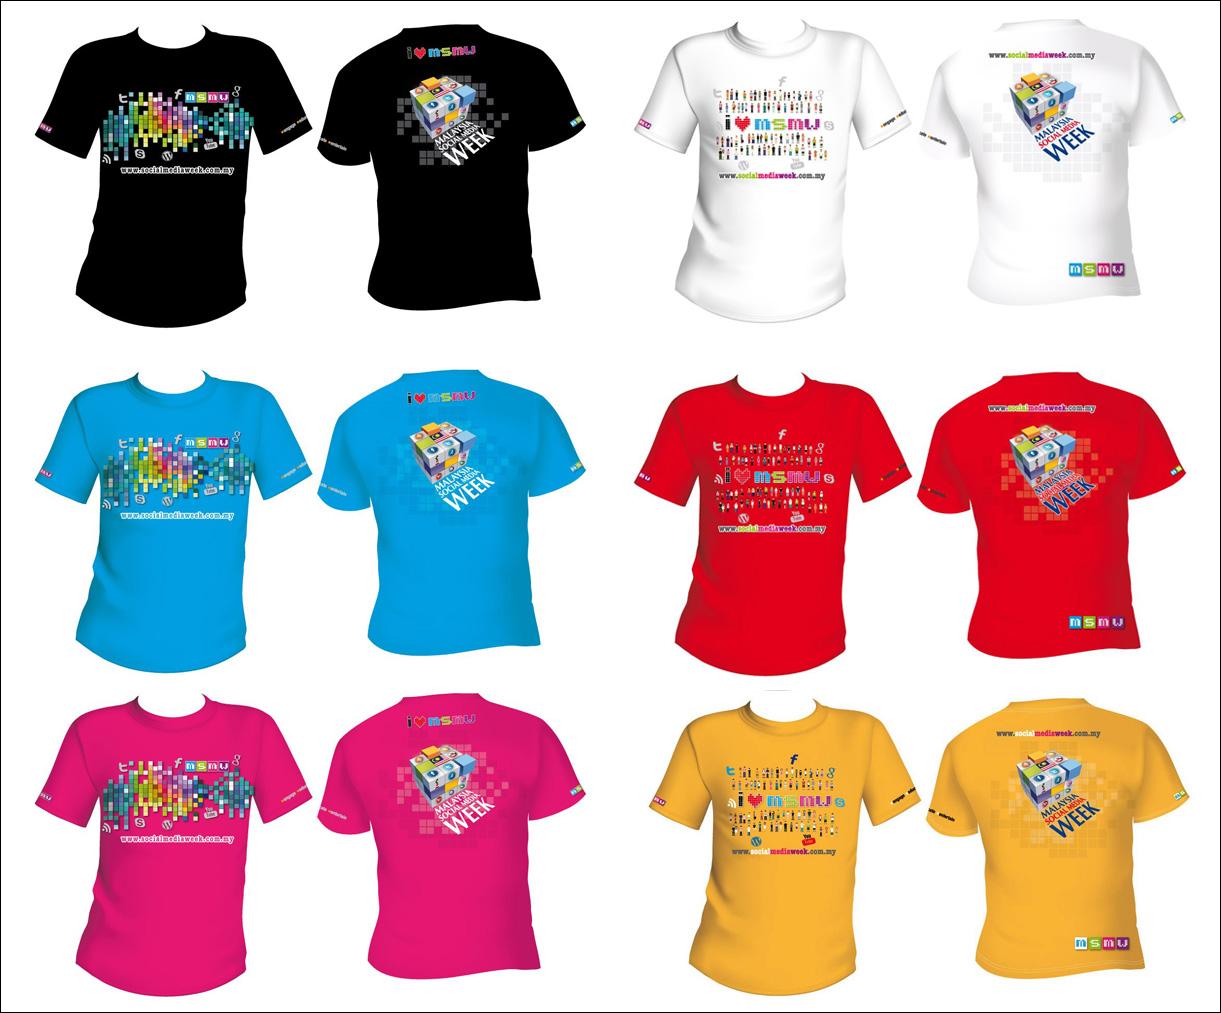 T-shirt MSMW 2013